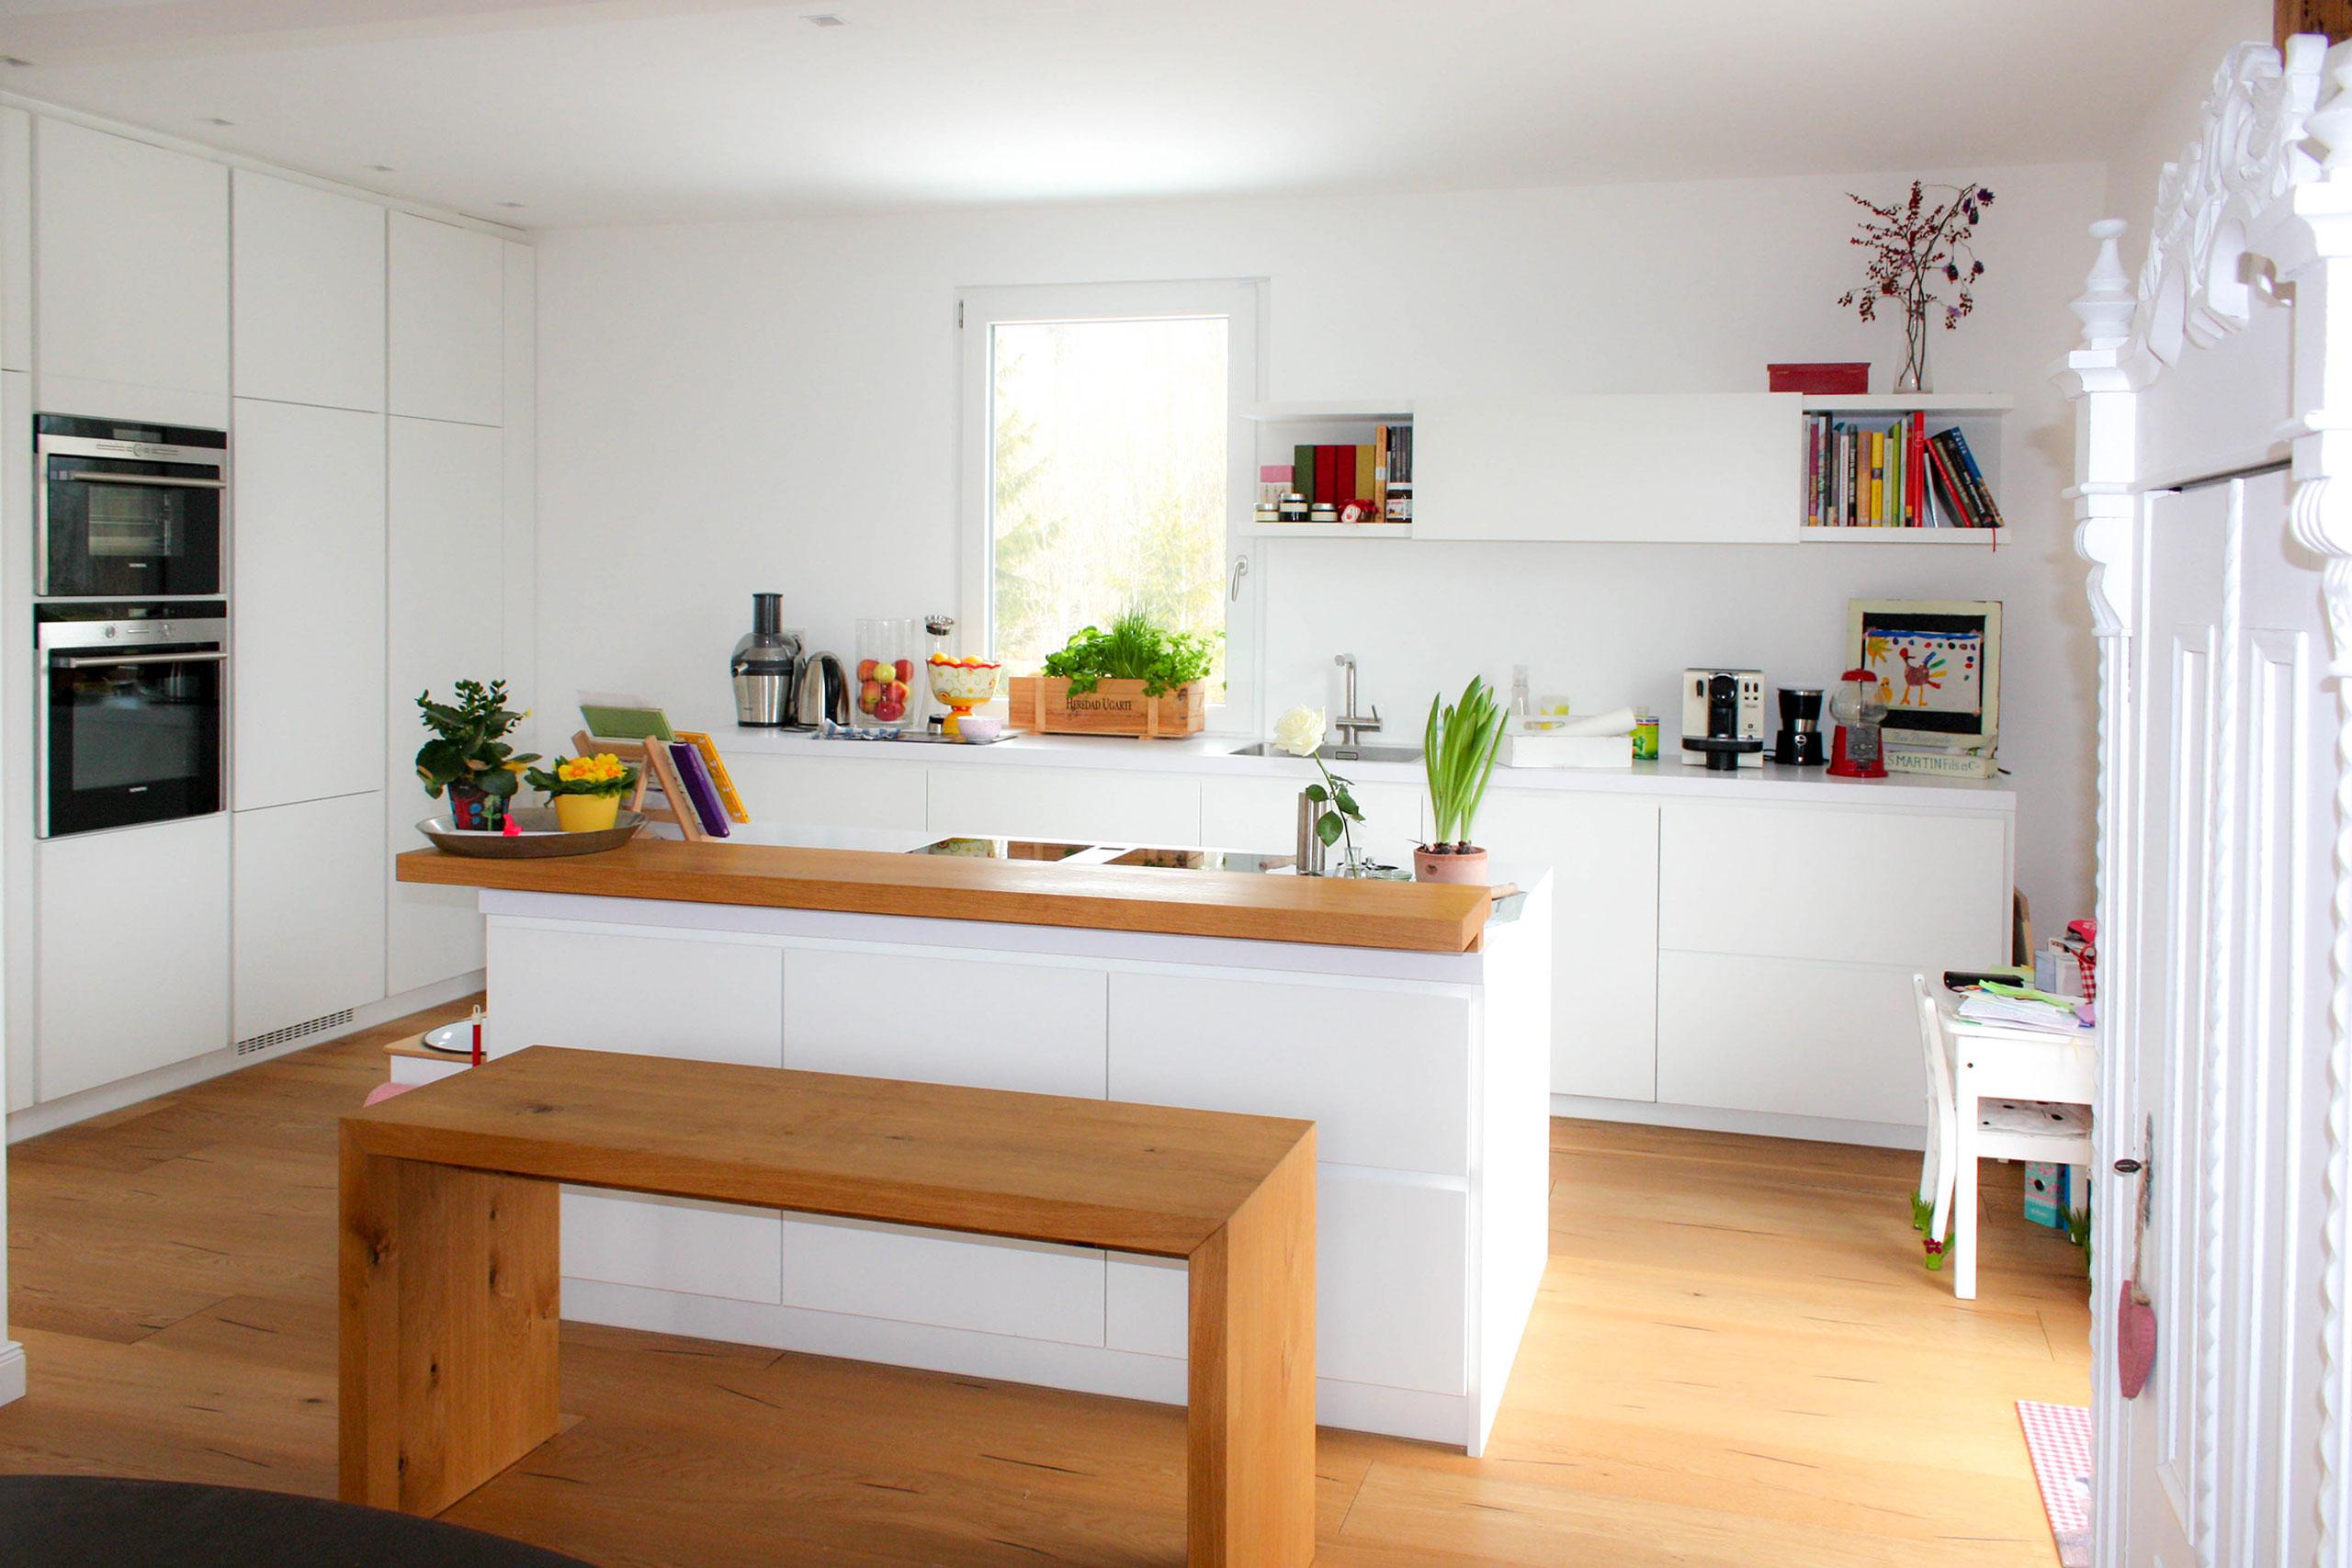 wei k chentheke m belwerkstatt boos. Black Bedroom Furniture Sets. Home Design Ideas